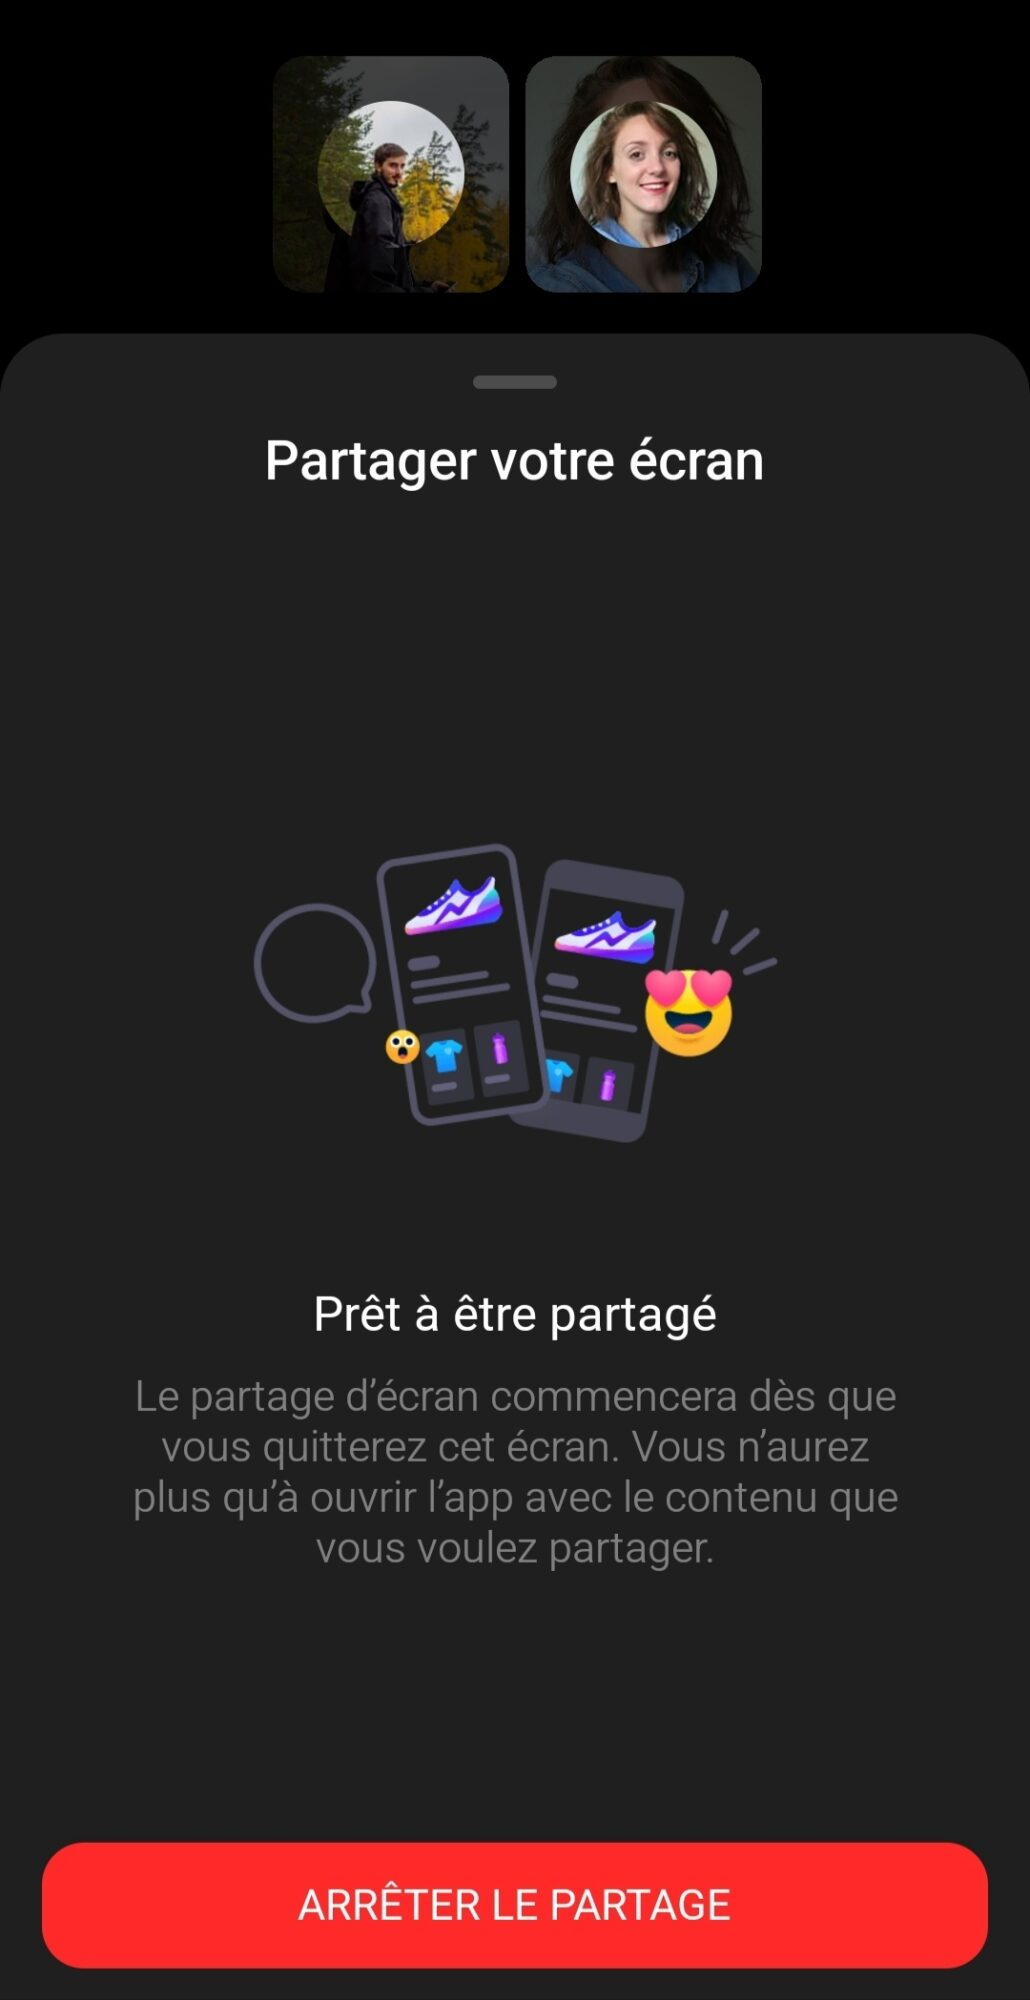 partager-votre-ecran-smartphone-android-facebook-messenger